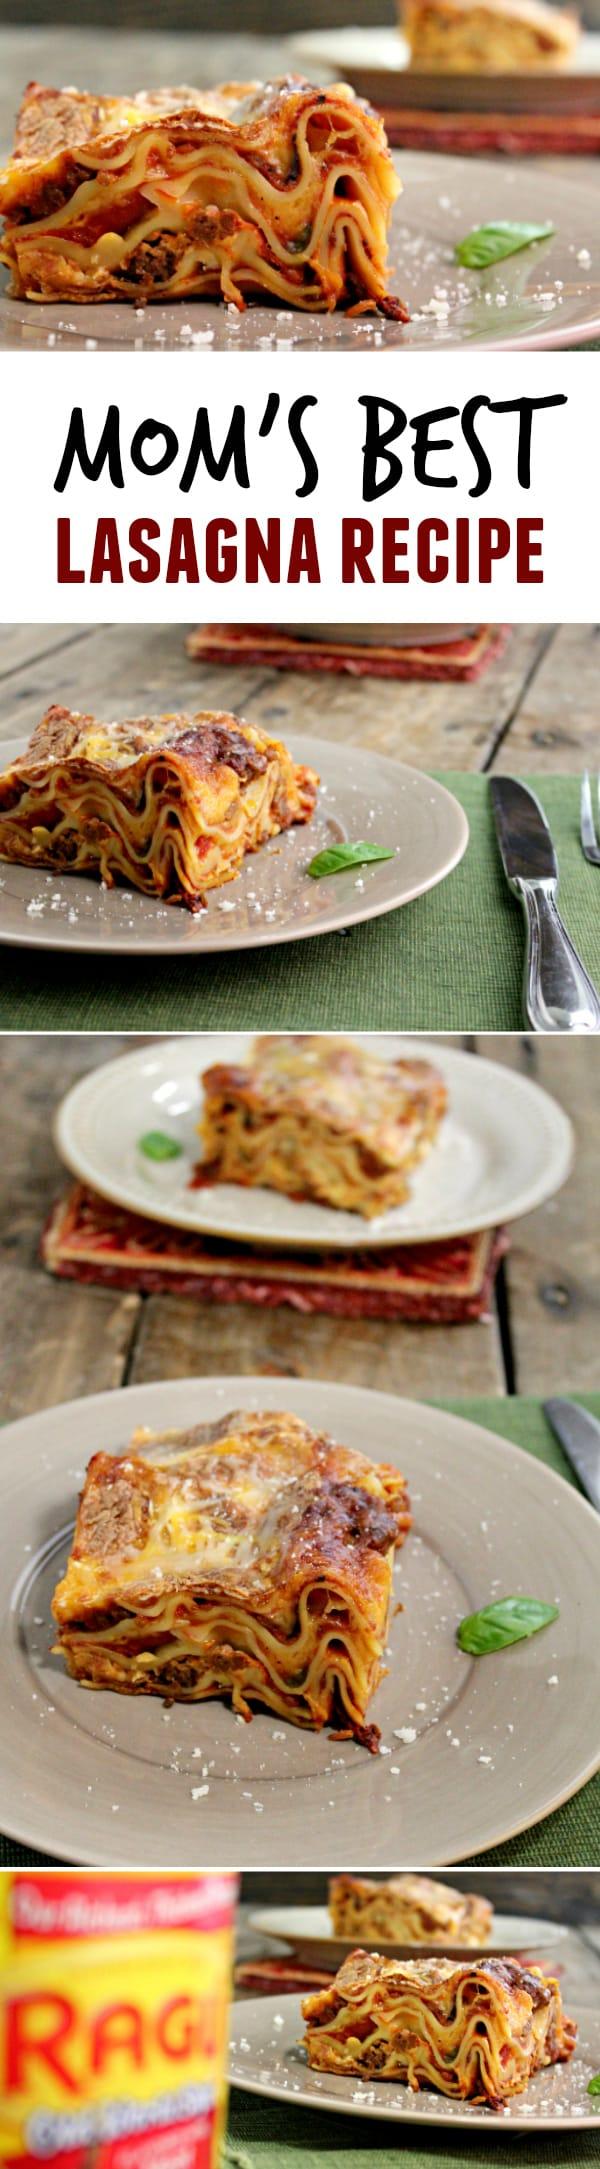 Moms best lasagna